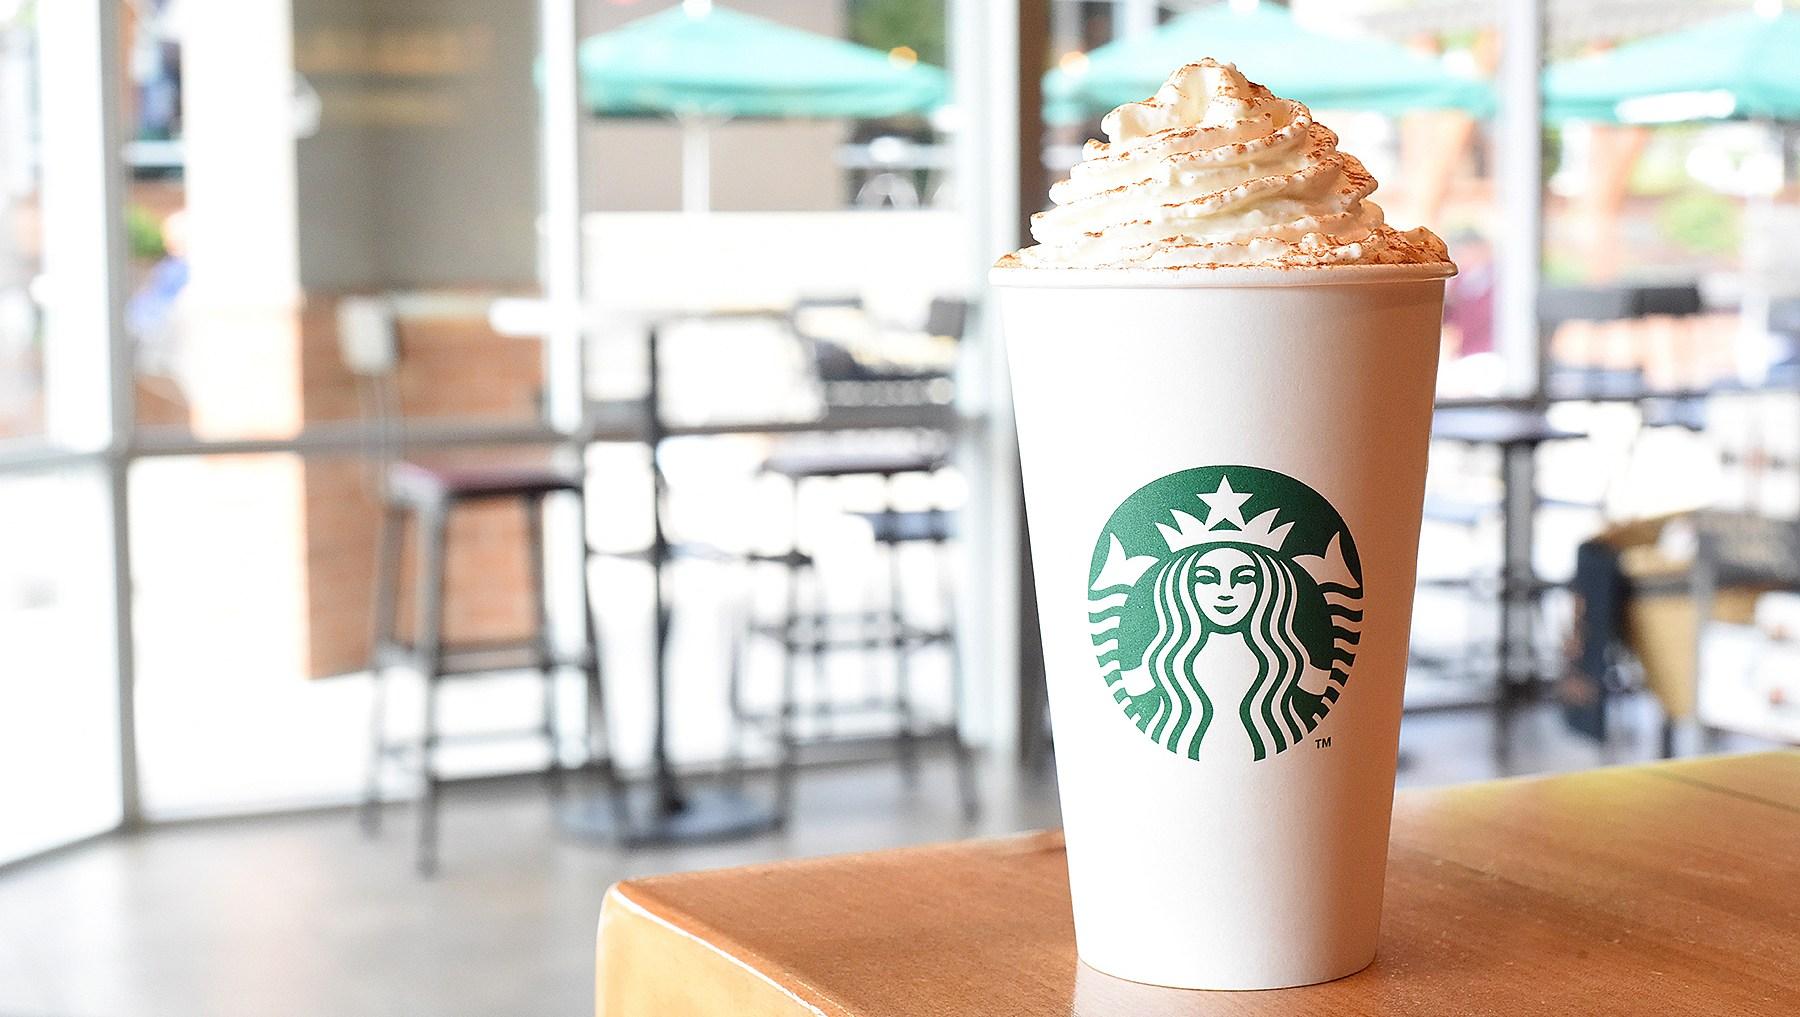 Starbucks' Pumpkin Spice Latte